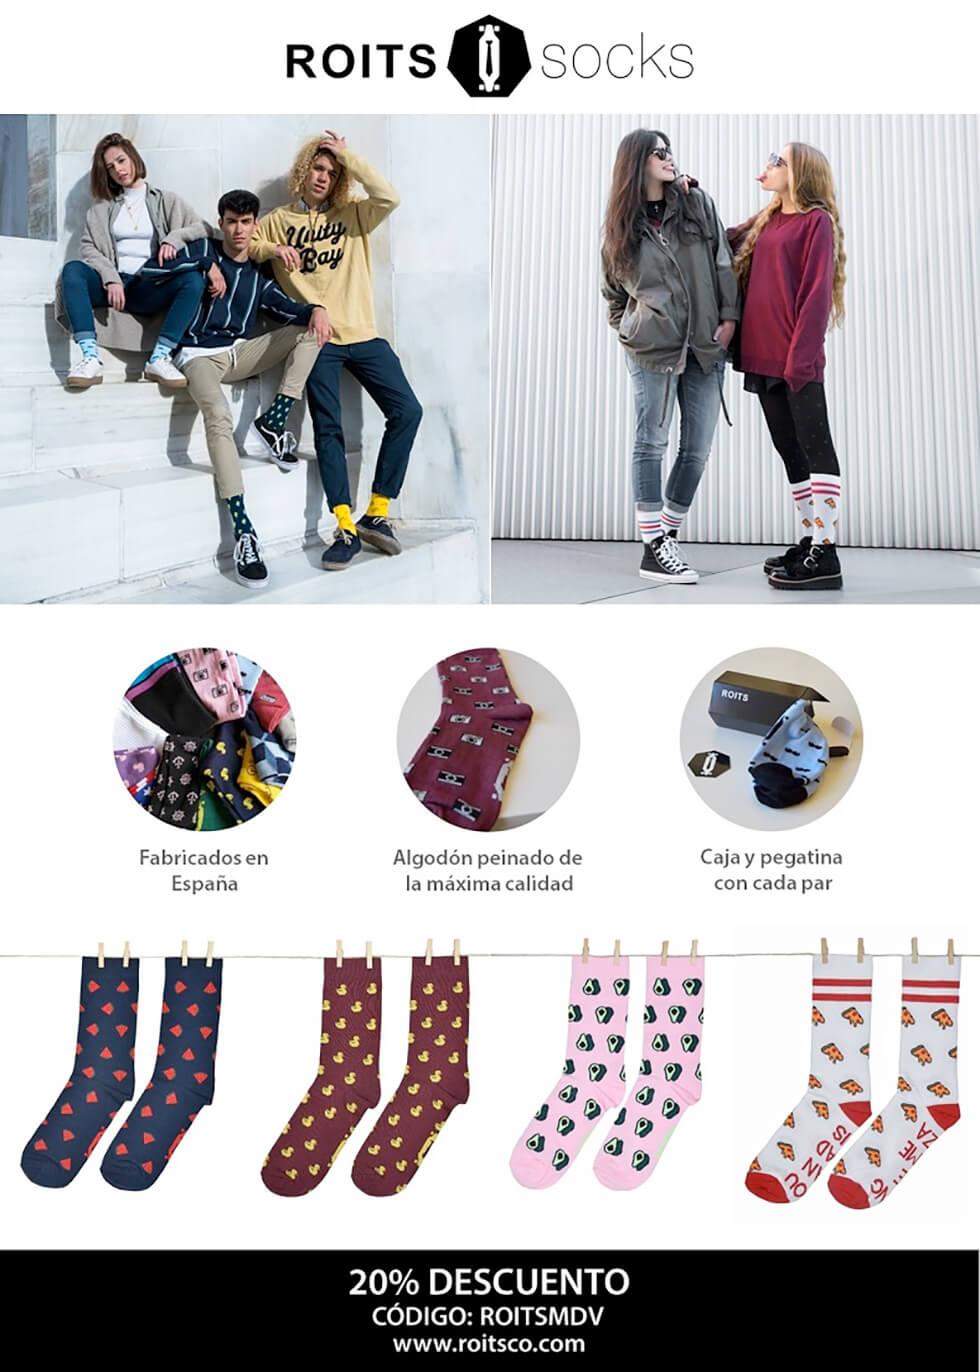 Roits socks